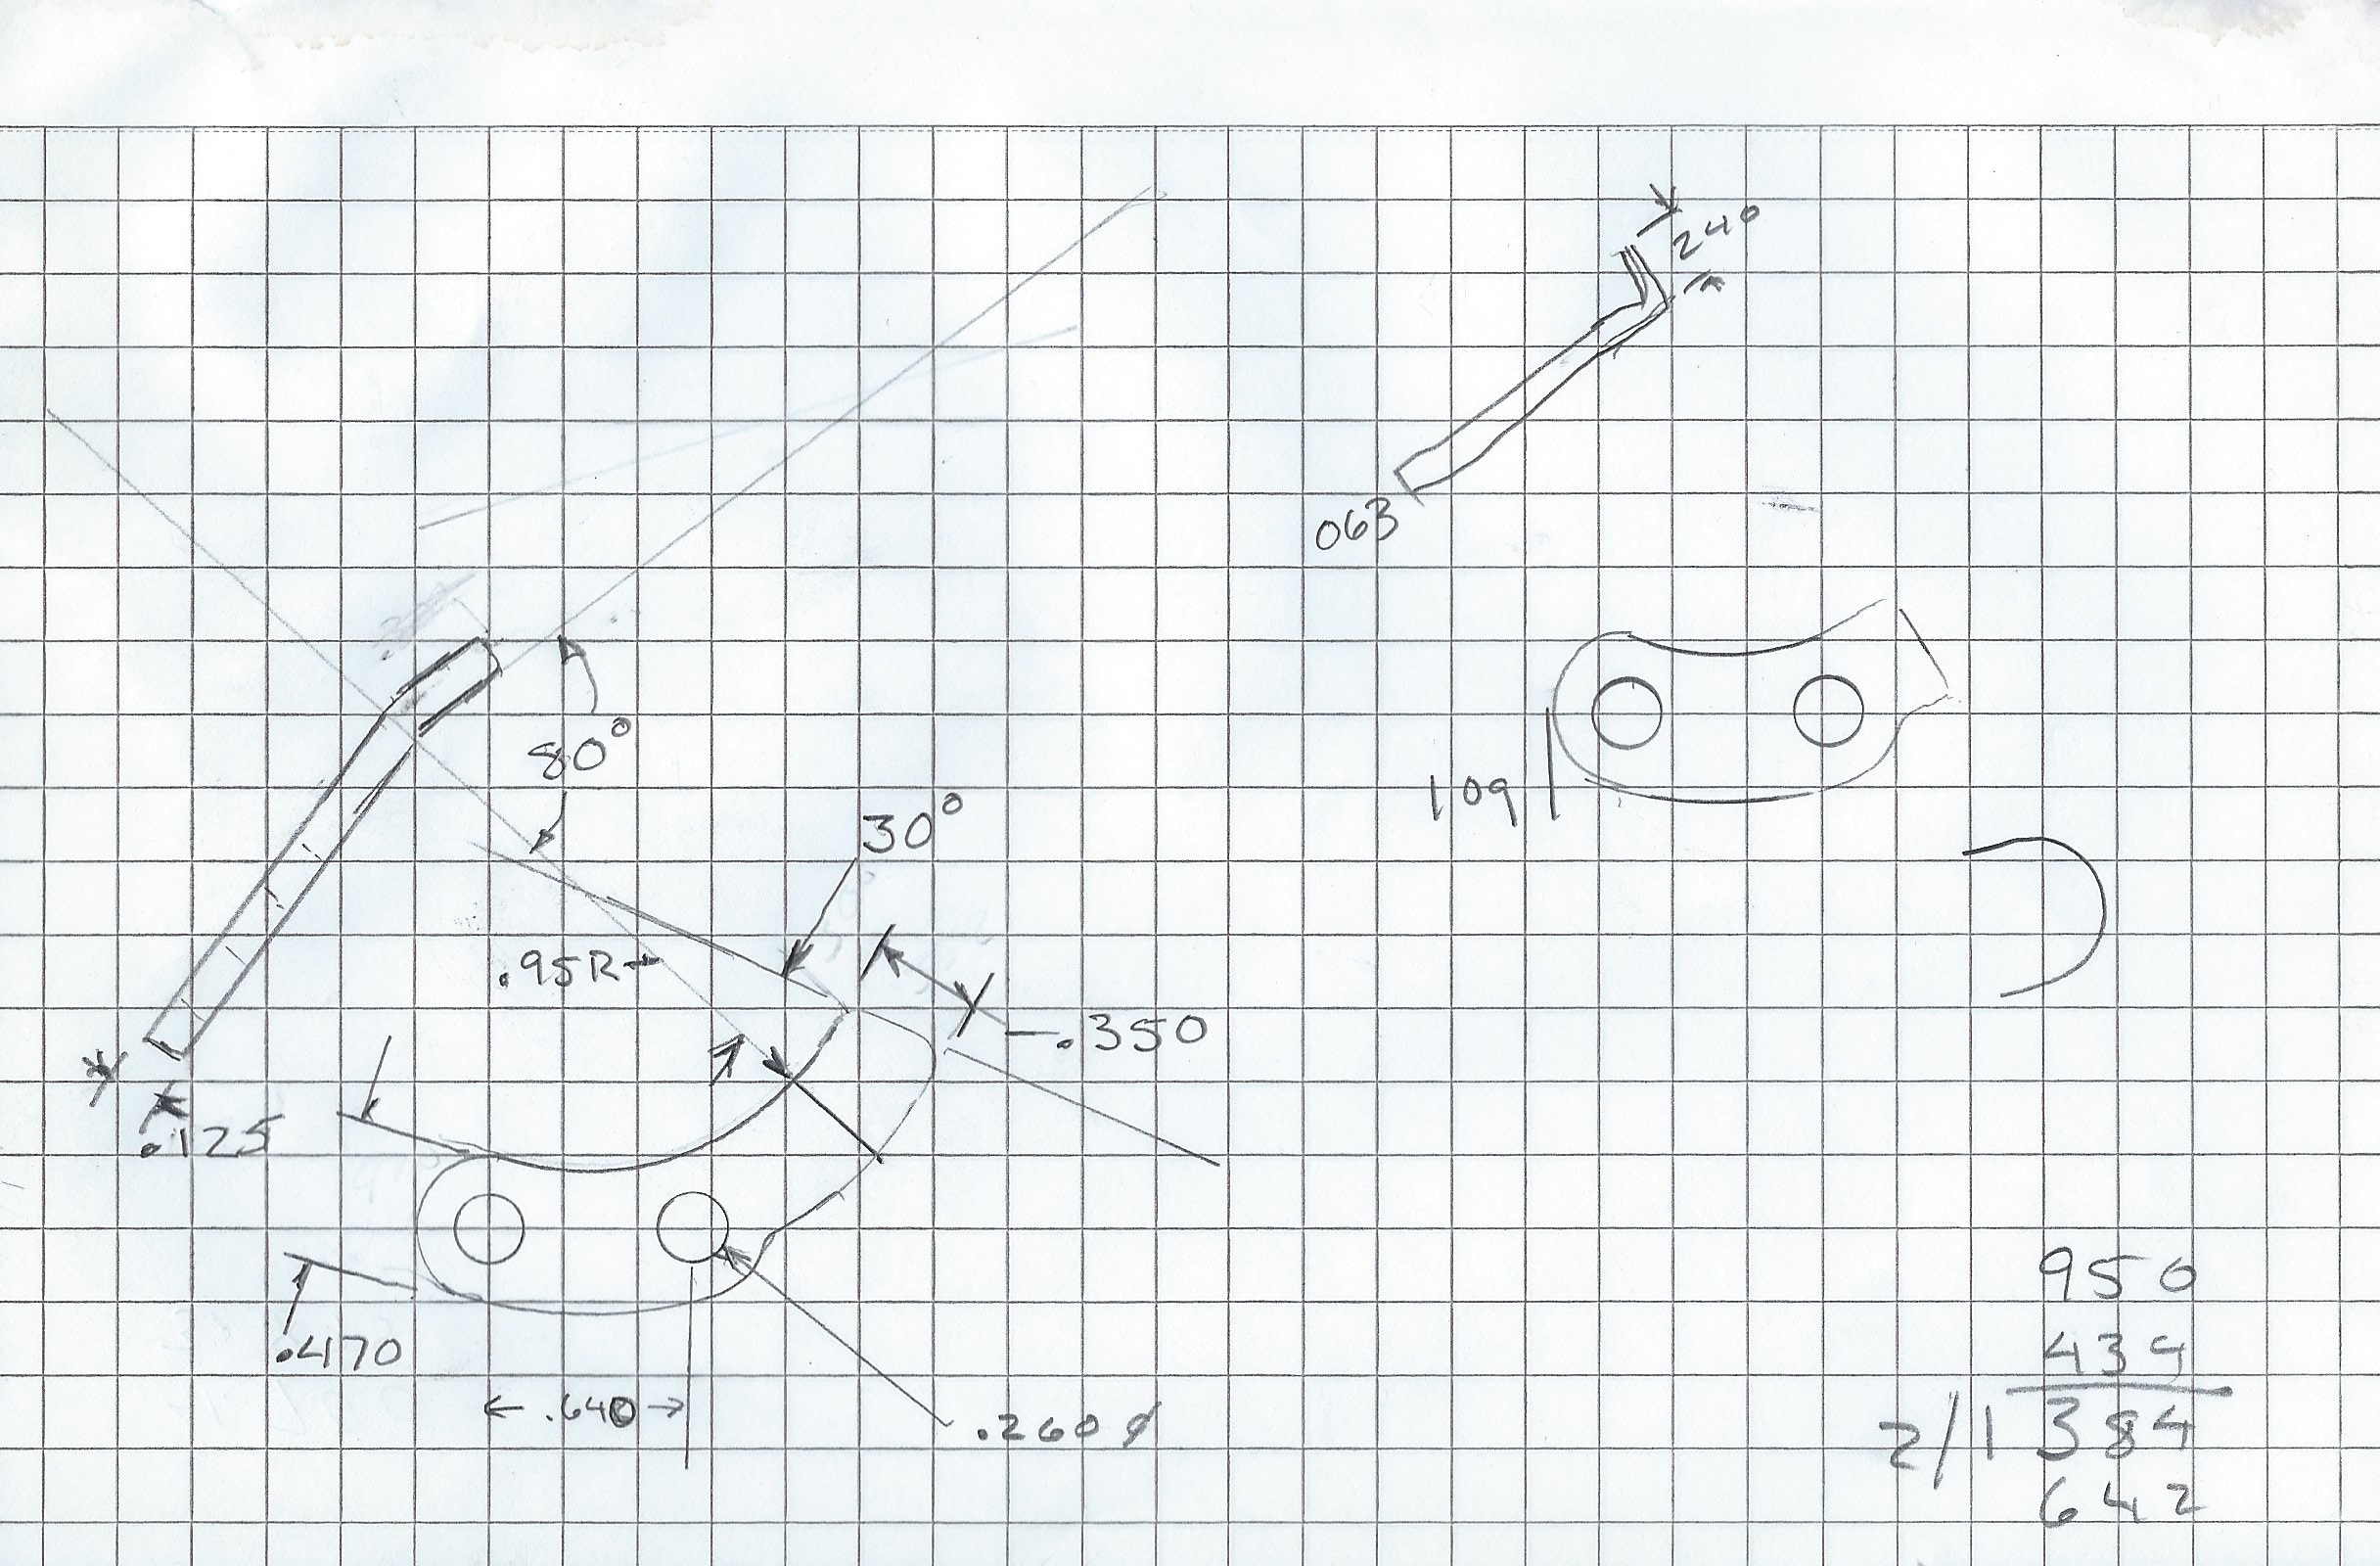 C4 Engine Tank in addition Car Blinker Circuit Diagram likewise Volvo Engine Ke Diagram further Kawasaki Mule 550 Carburetor Diagram also Stebel Nautilus Horn Wiring Diagram. on klr 650 battery